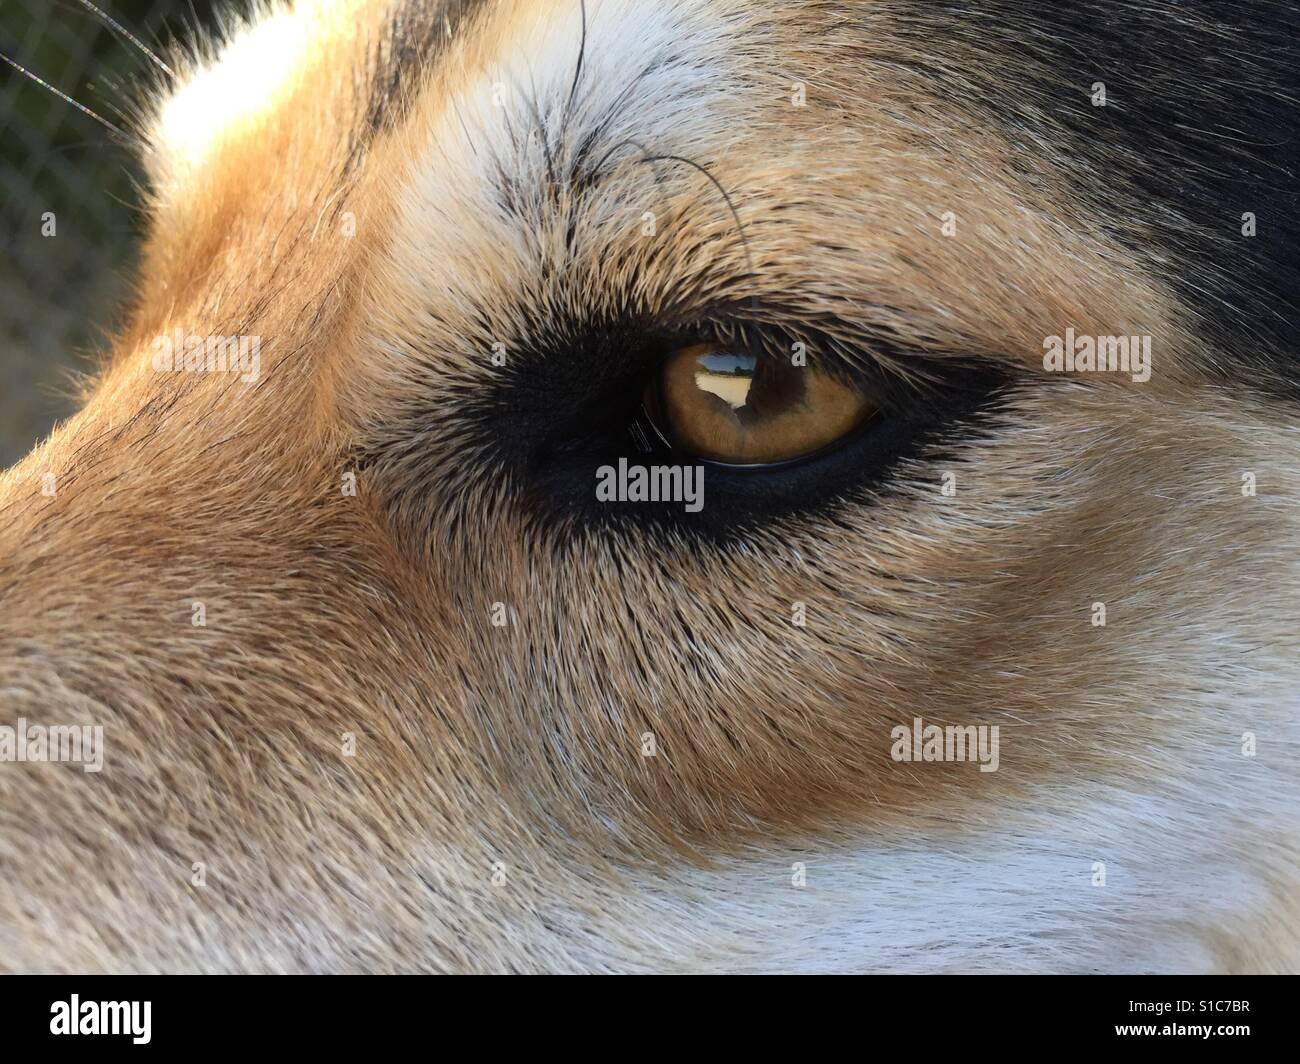 Lovely german shepherd dog pet eye closer - Stock Image